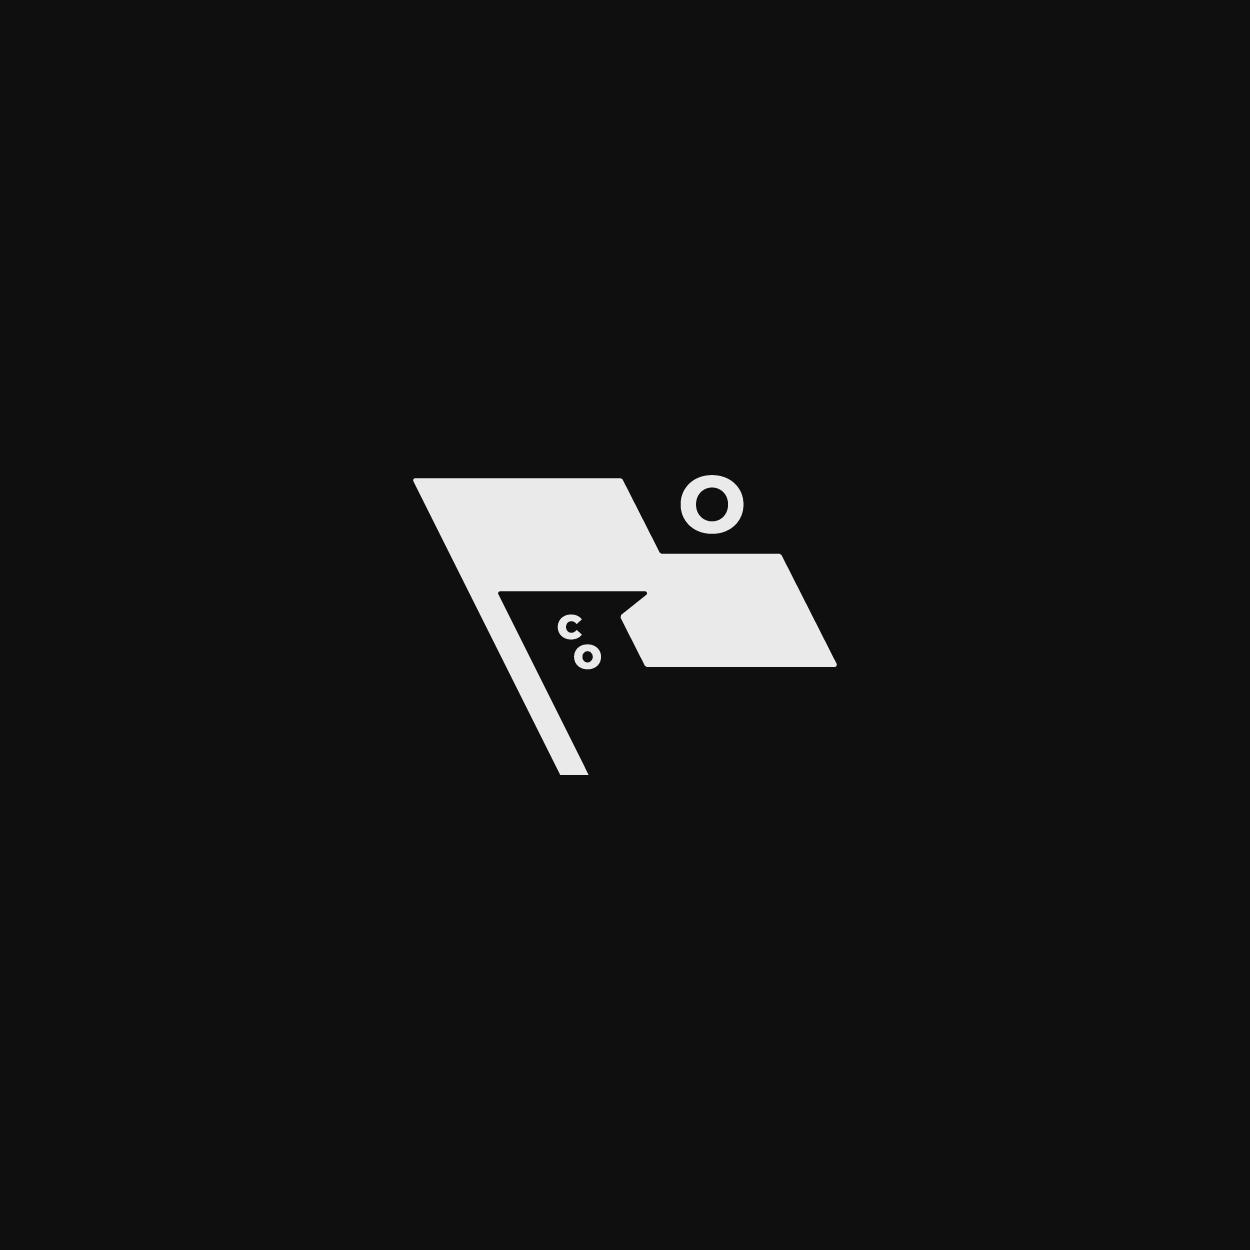 Sylvan_Logofolio2019_Artboard 153 copy1250.jpg